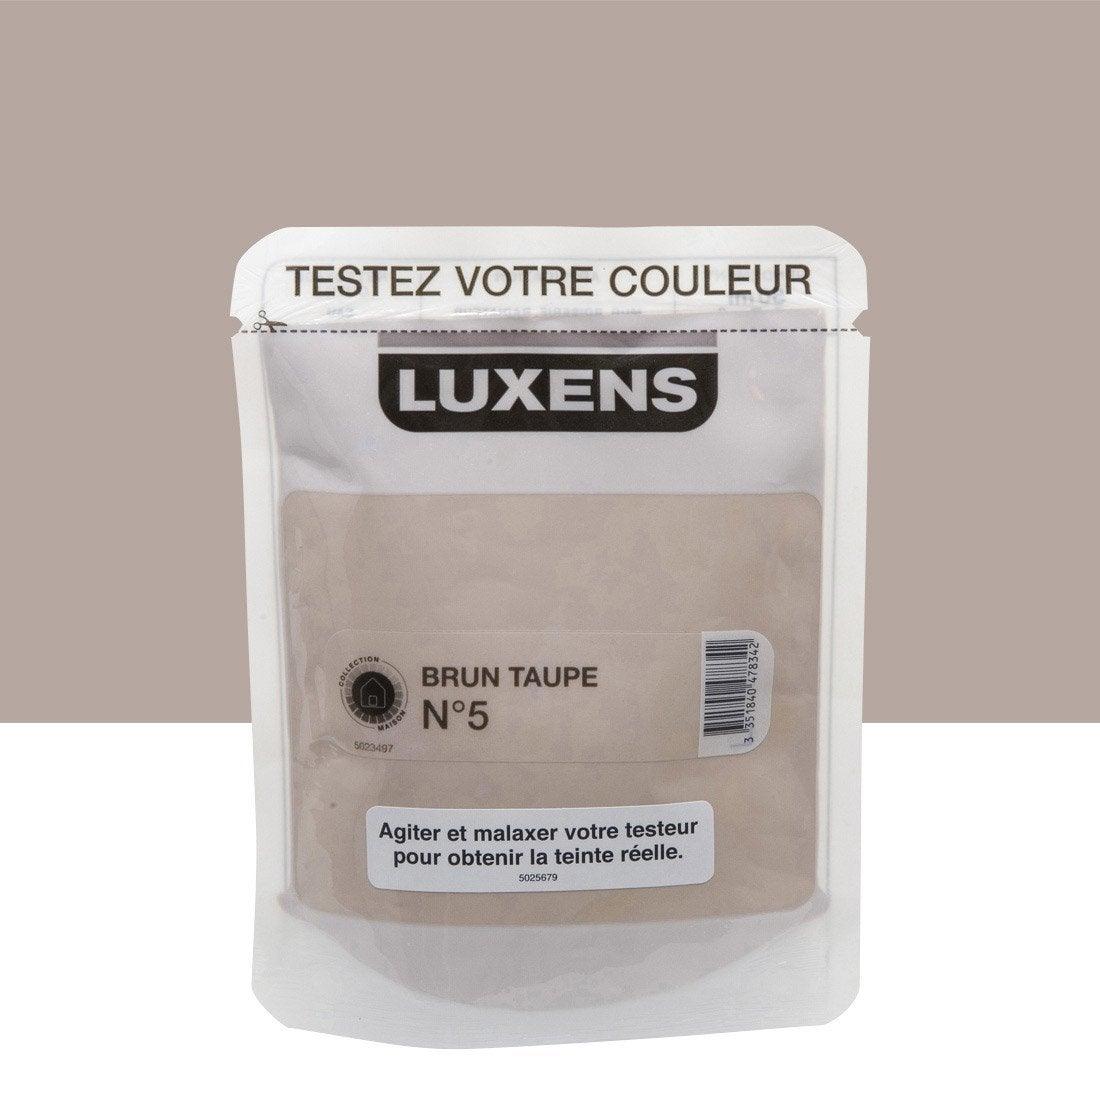 testeur peinture brun taupe 5 satin luxens couleurs int rieures satin l leroy merlin. Black Bedroom Furniture Sets. Home Design Ideas